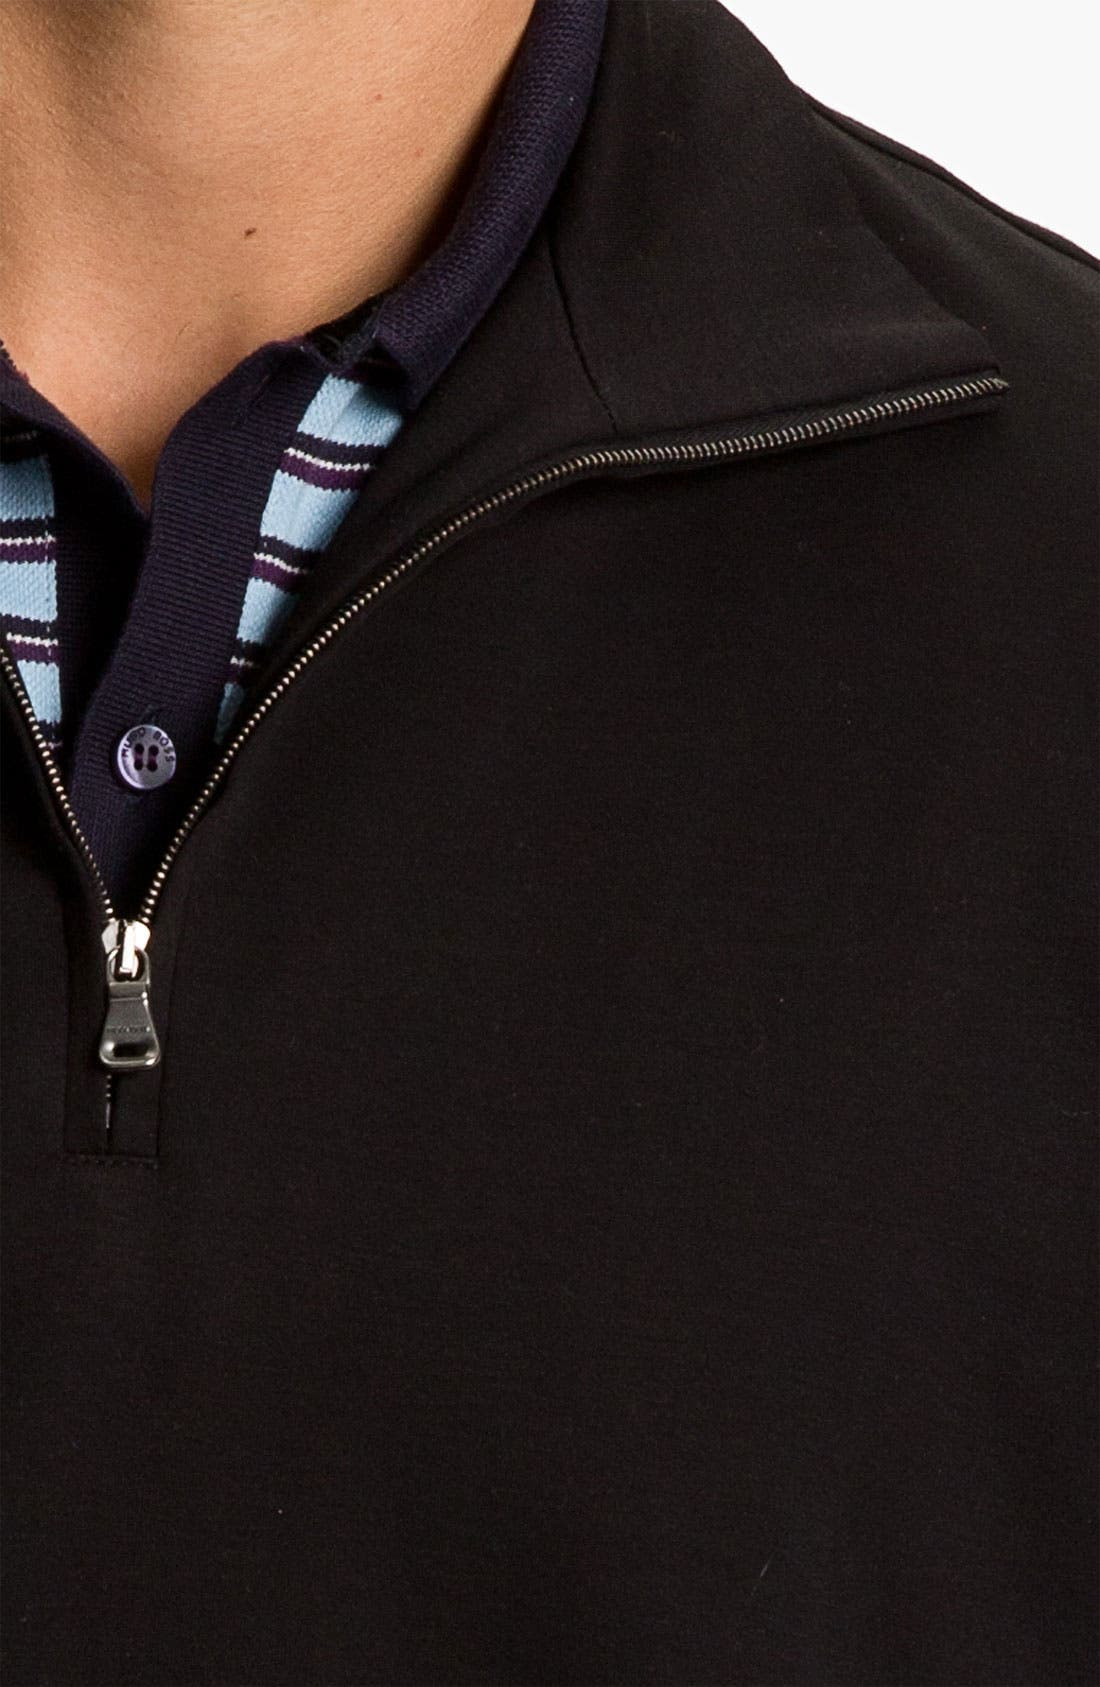 Black 'Padua' Quarter Zip Pullover,                             Alternate thumbnail 3, color,                             001